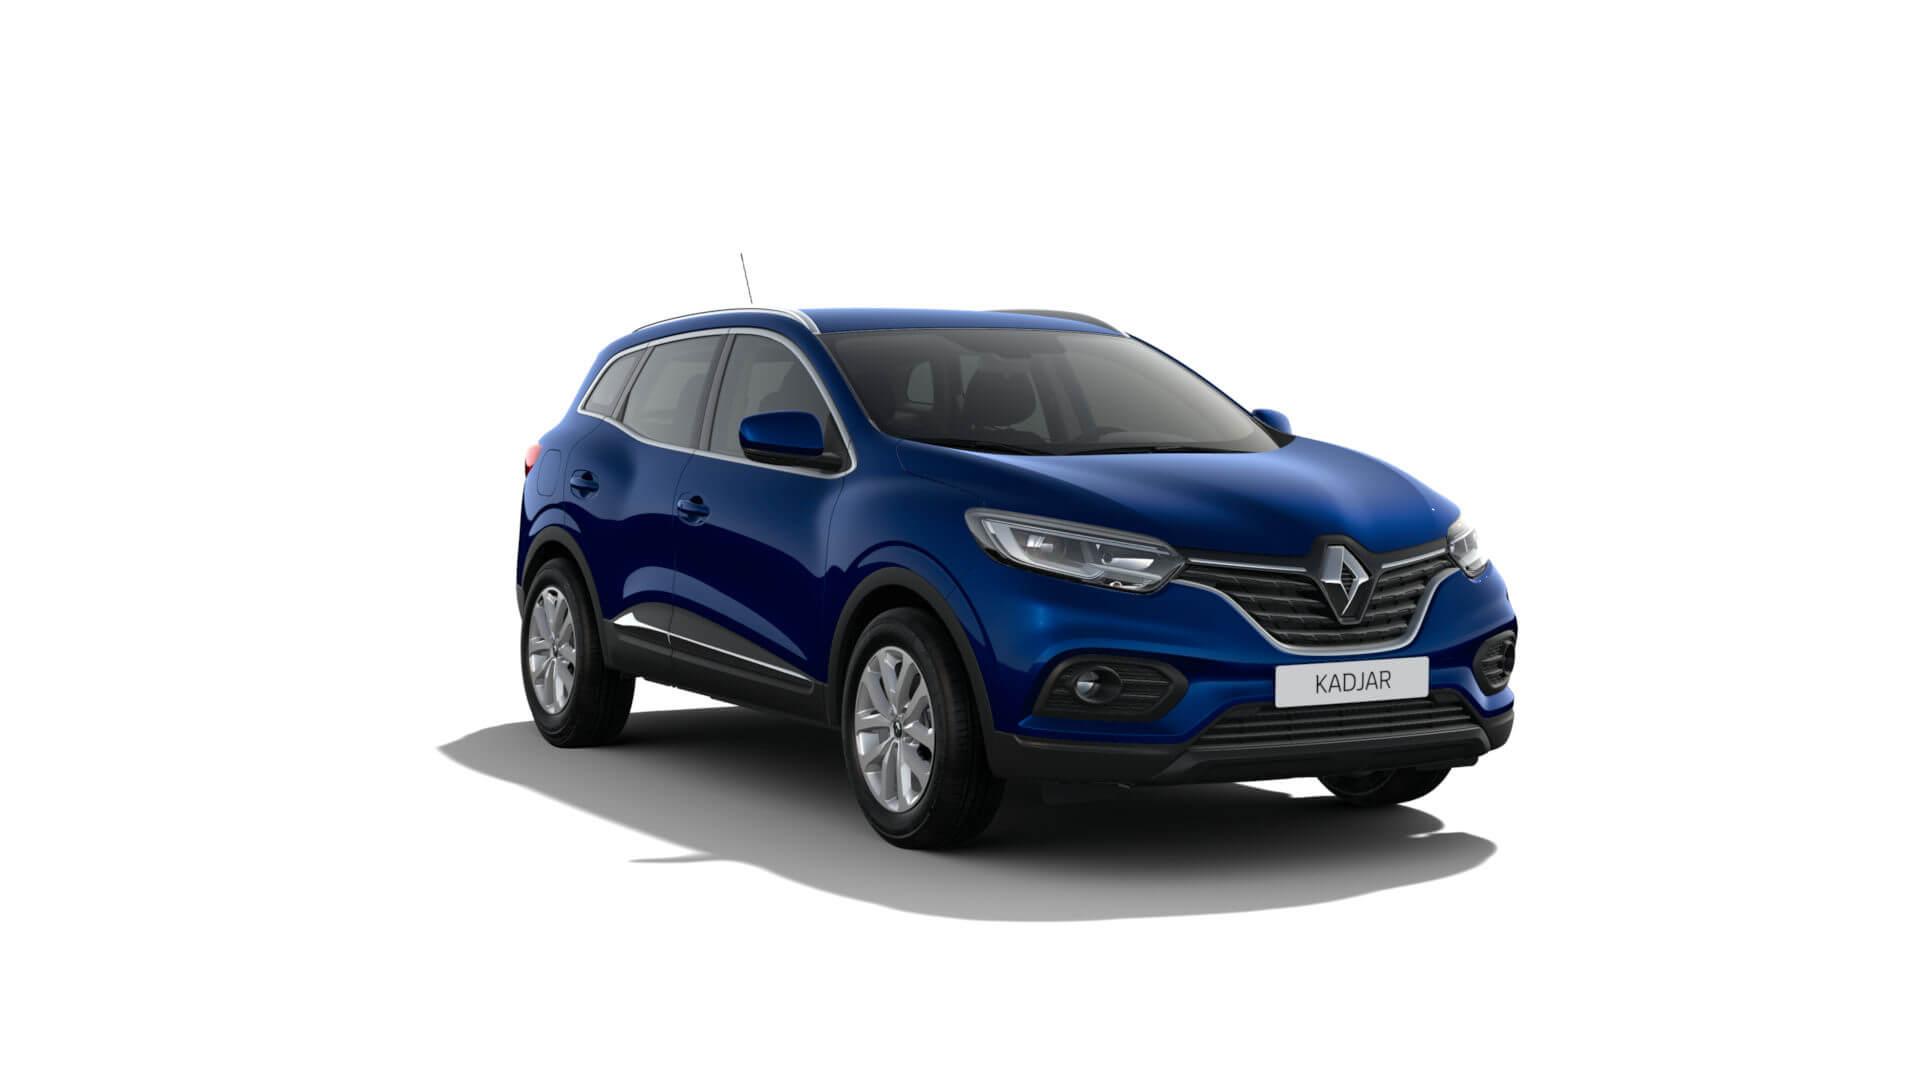 Automodell blau - Renault Kadjar - Renault Ahrens Hannover